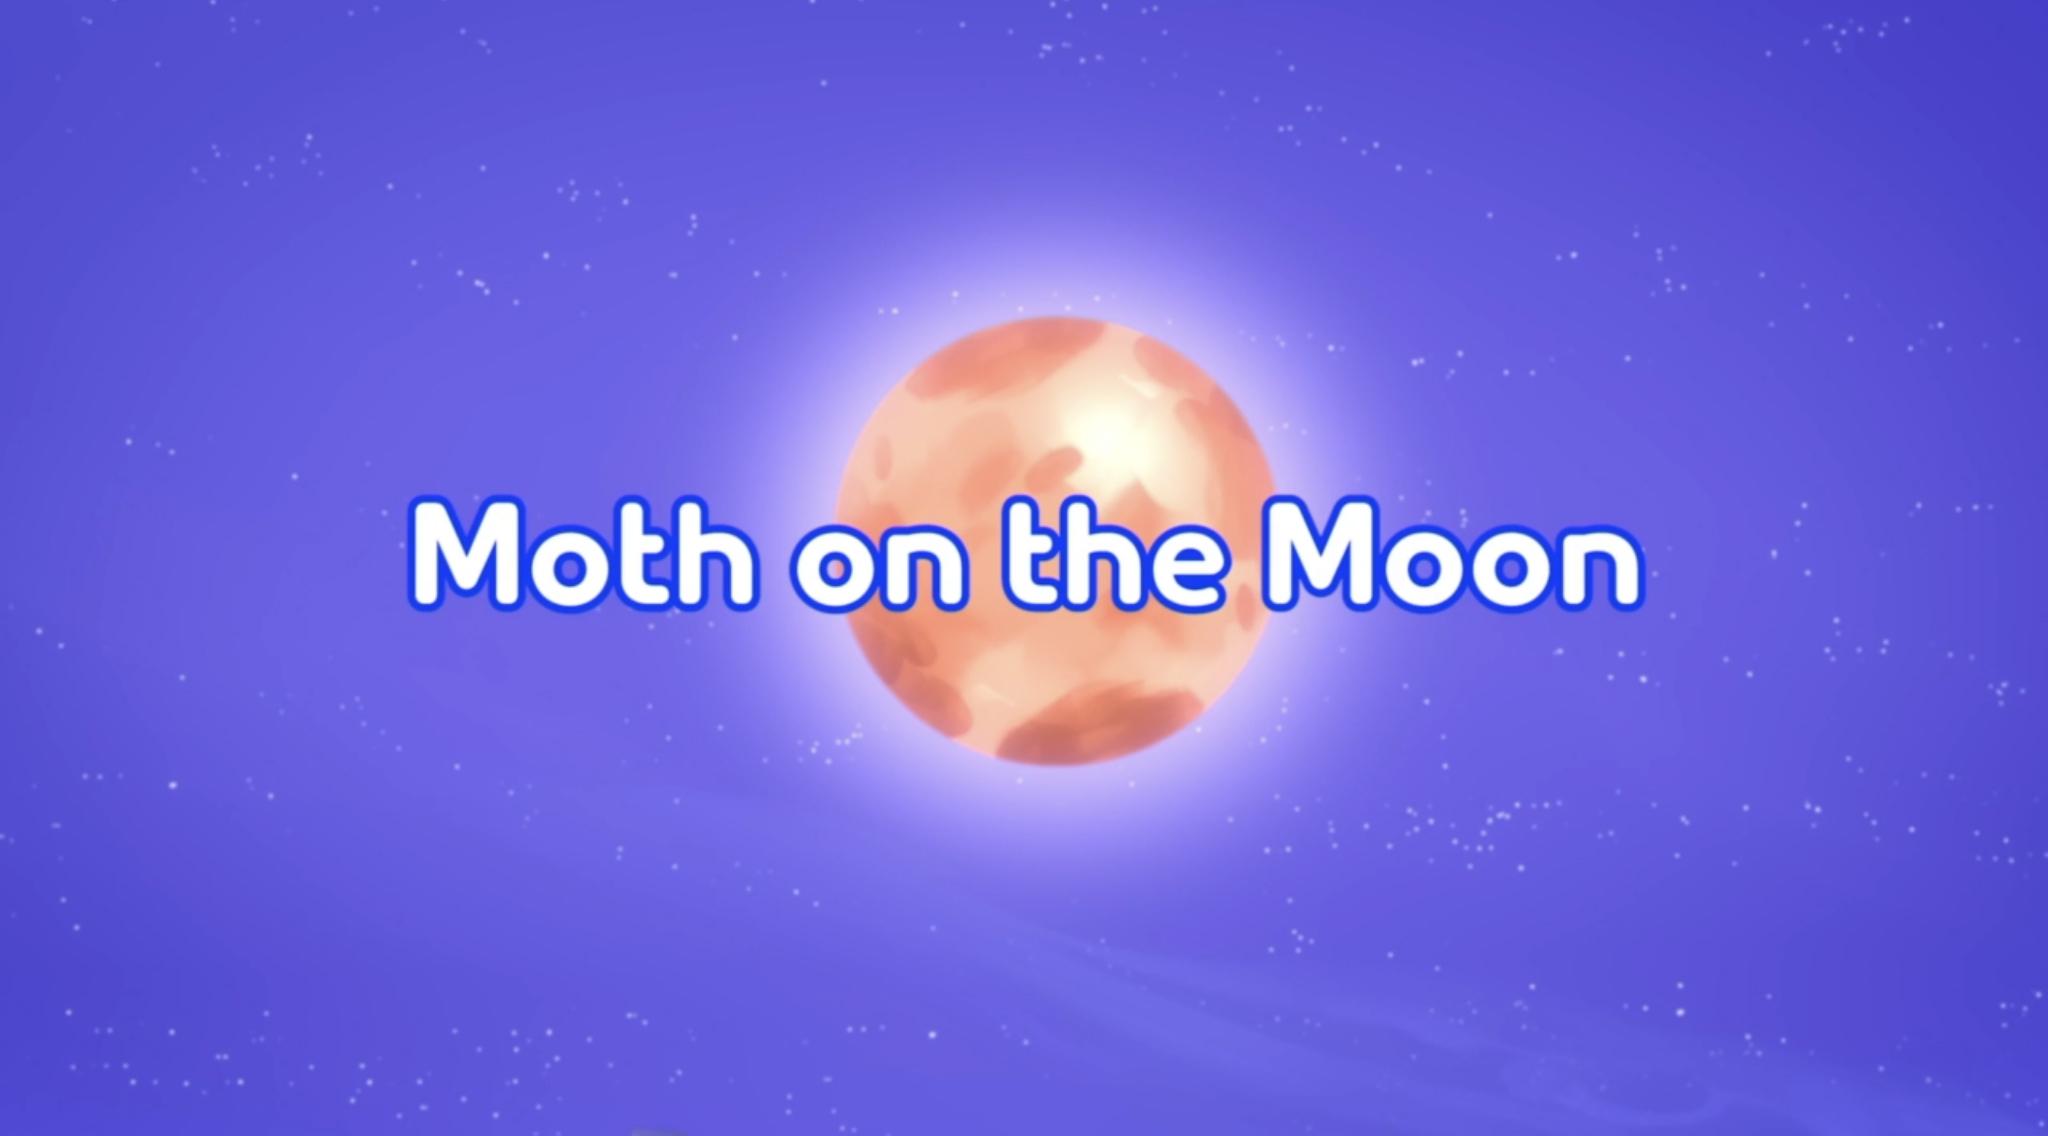 Moth on the Moon